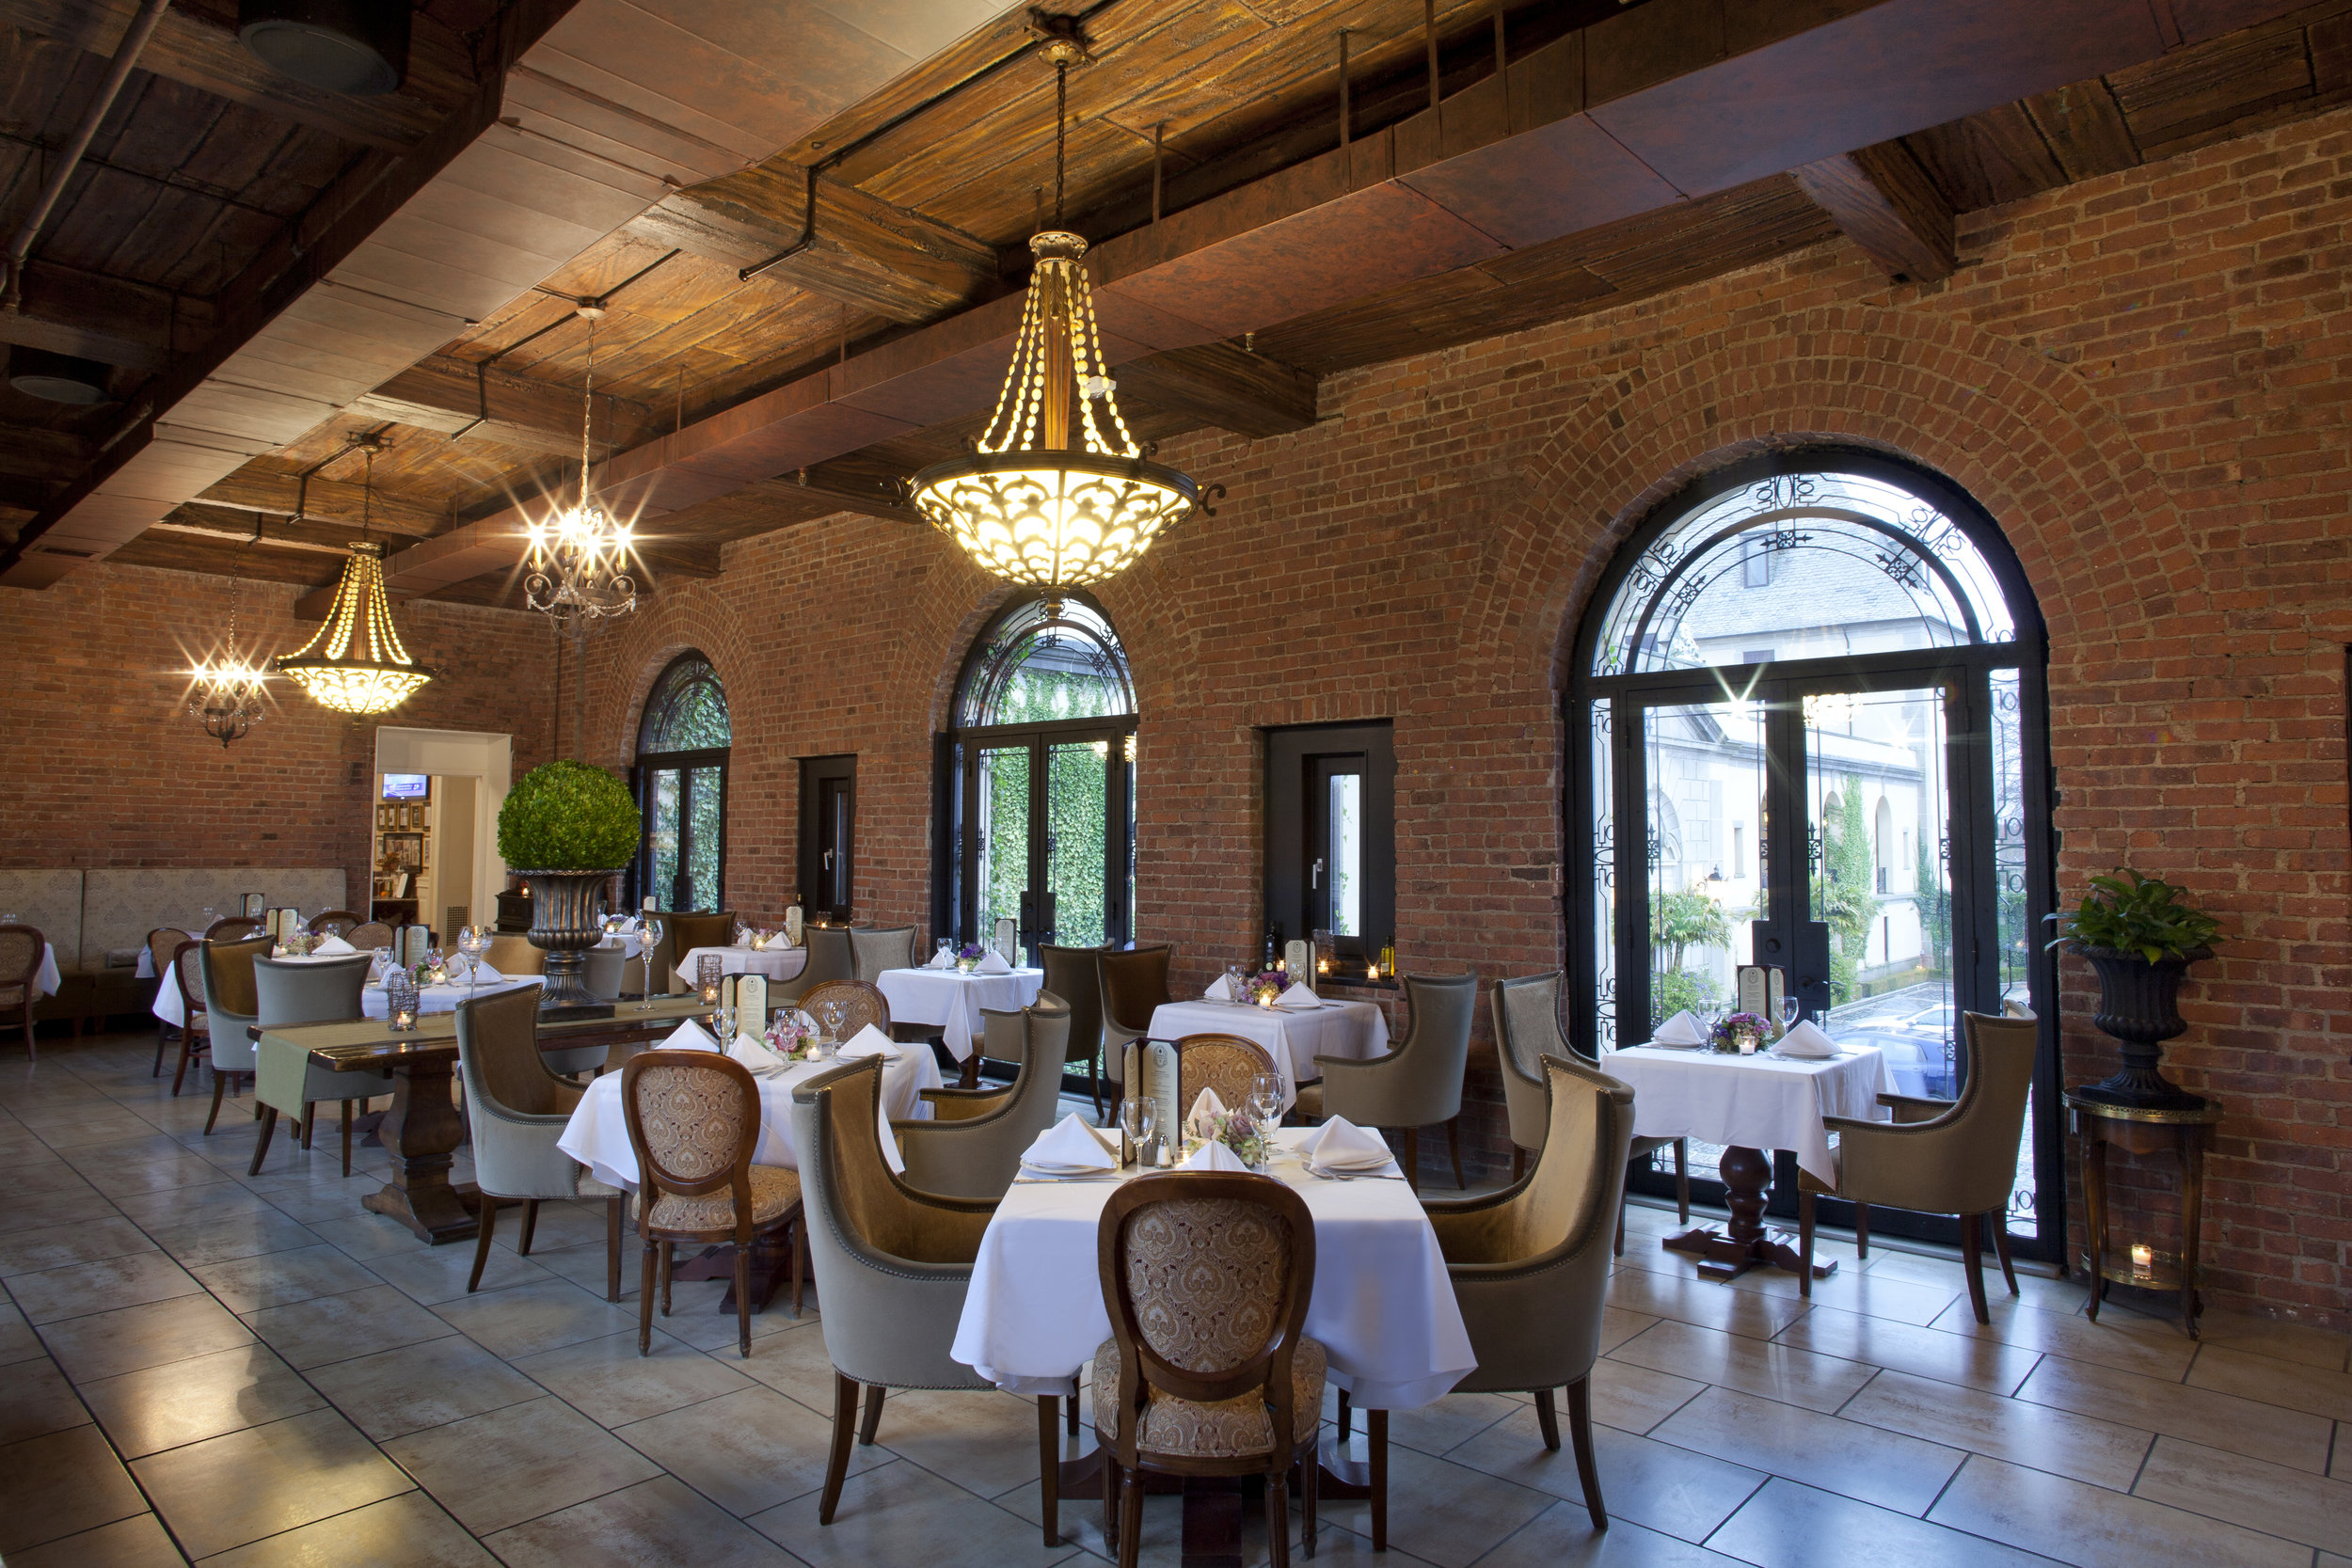 OHEKA Bar & Restaurant Dining Room_2_Brett Matthews Photography.jpg